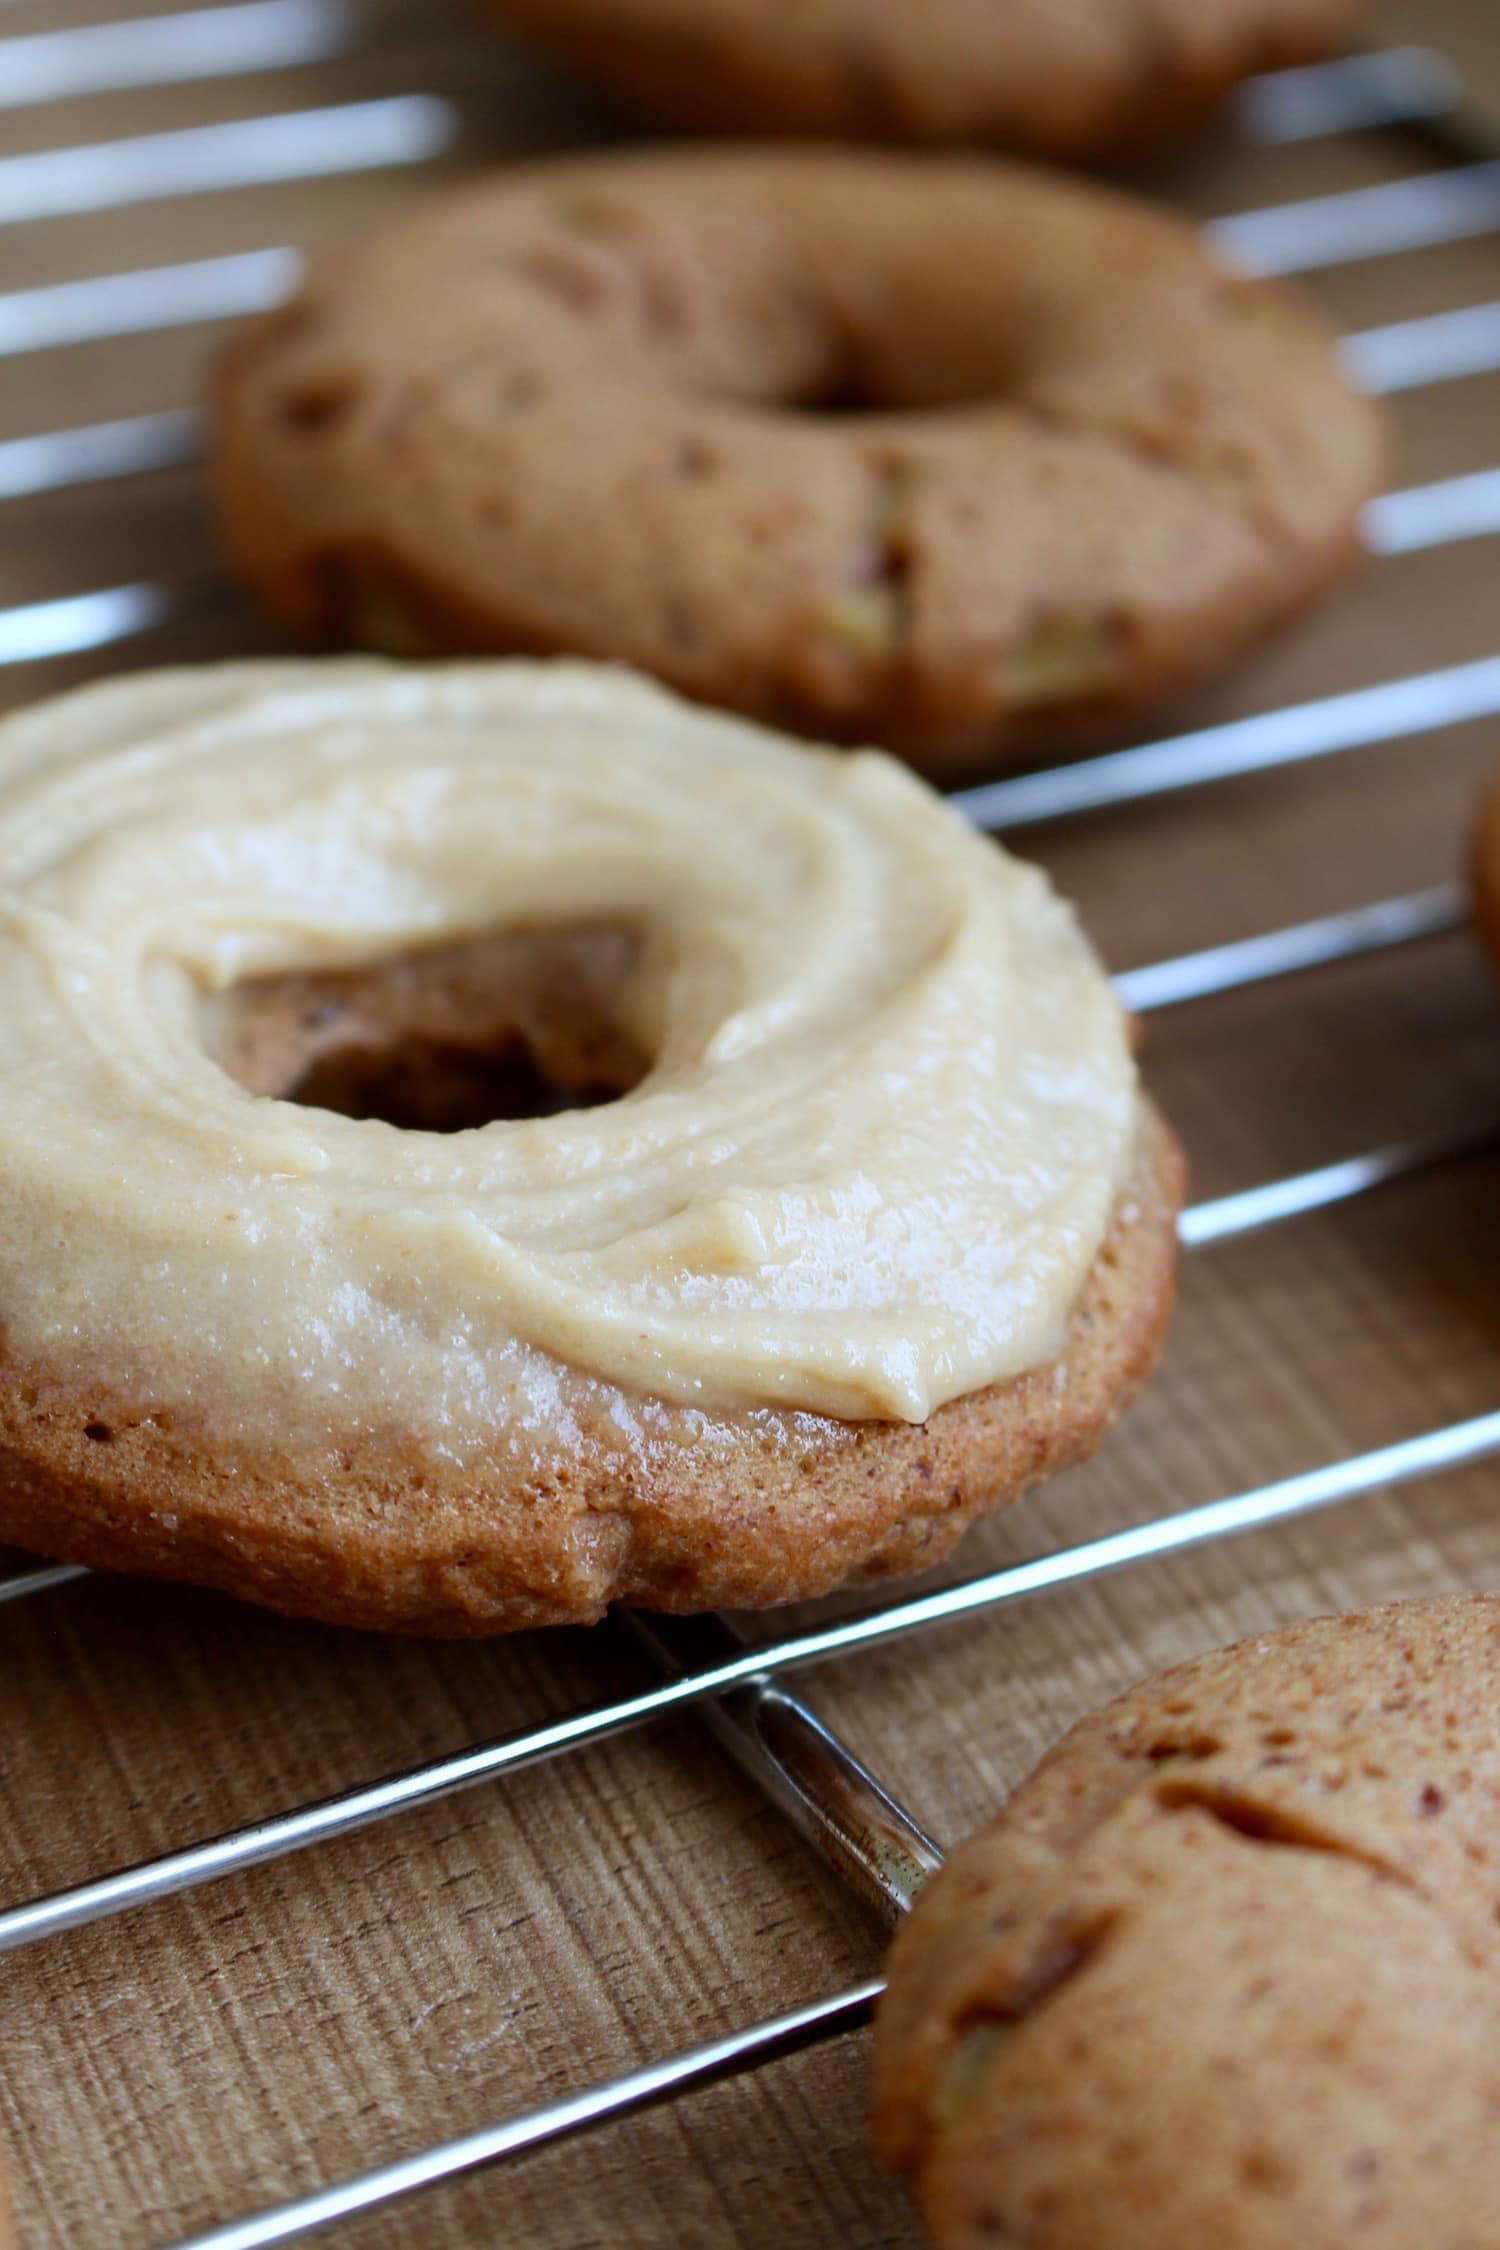 Vegan Apple Cinnamon Baked Doughnuts | The Conscientious Eater